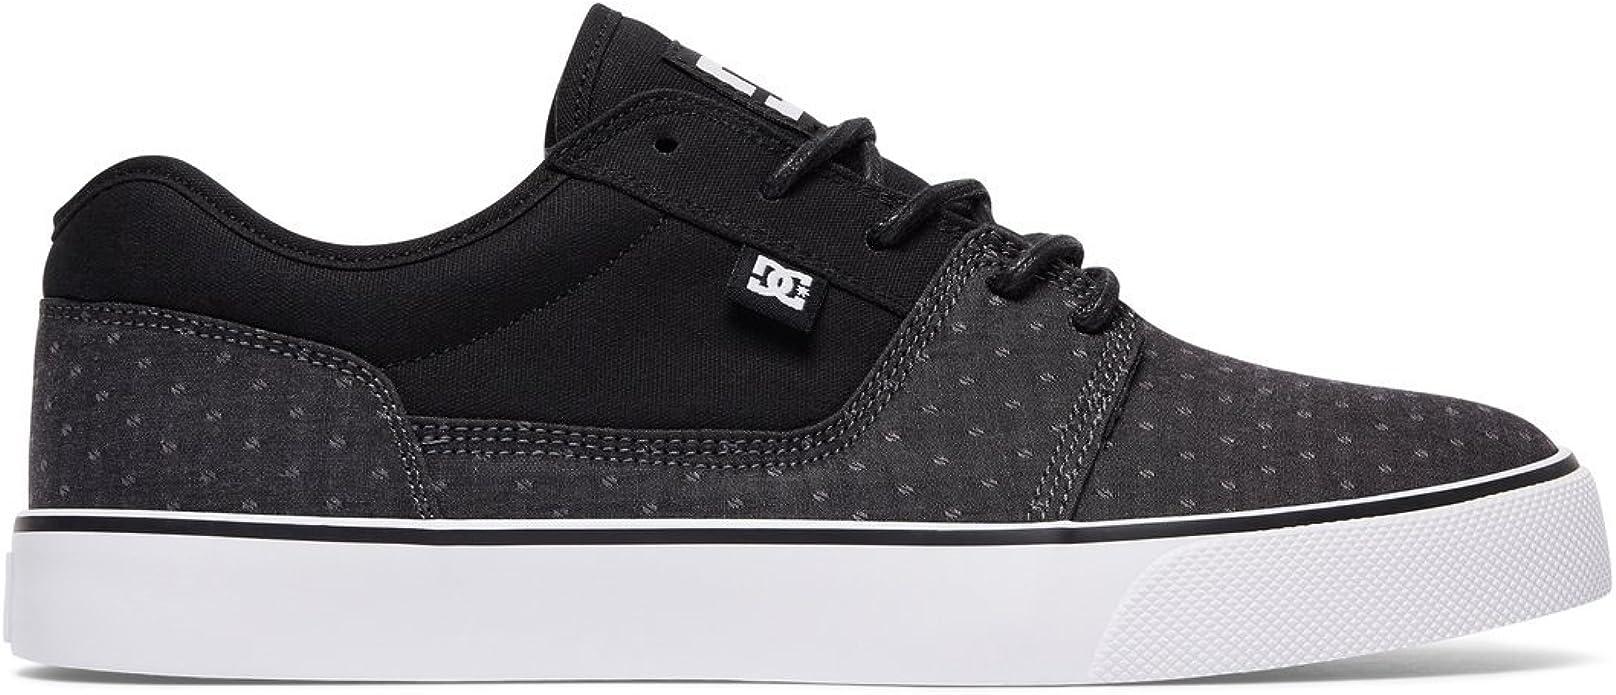 DC Shoes Tonik TX SE Sneakers Skateschuhe Herren Schwarz/Grau Pünktchen (Polka Dot)